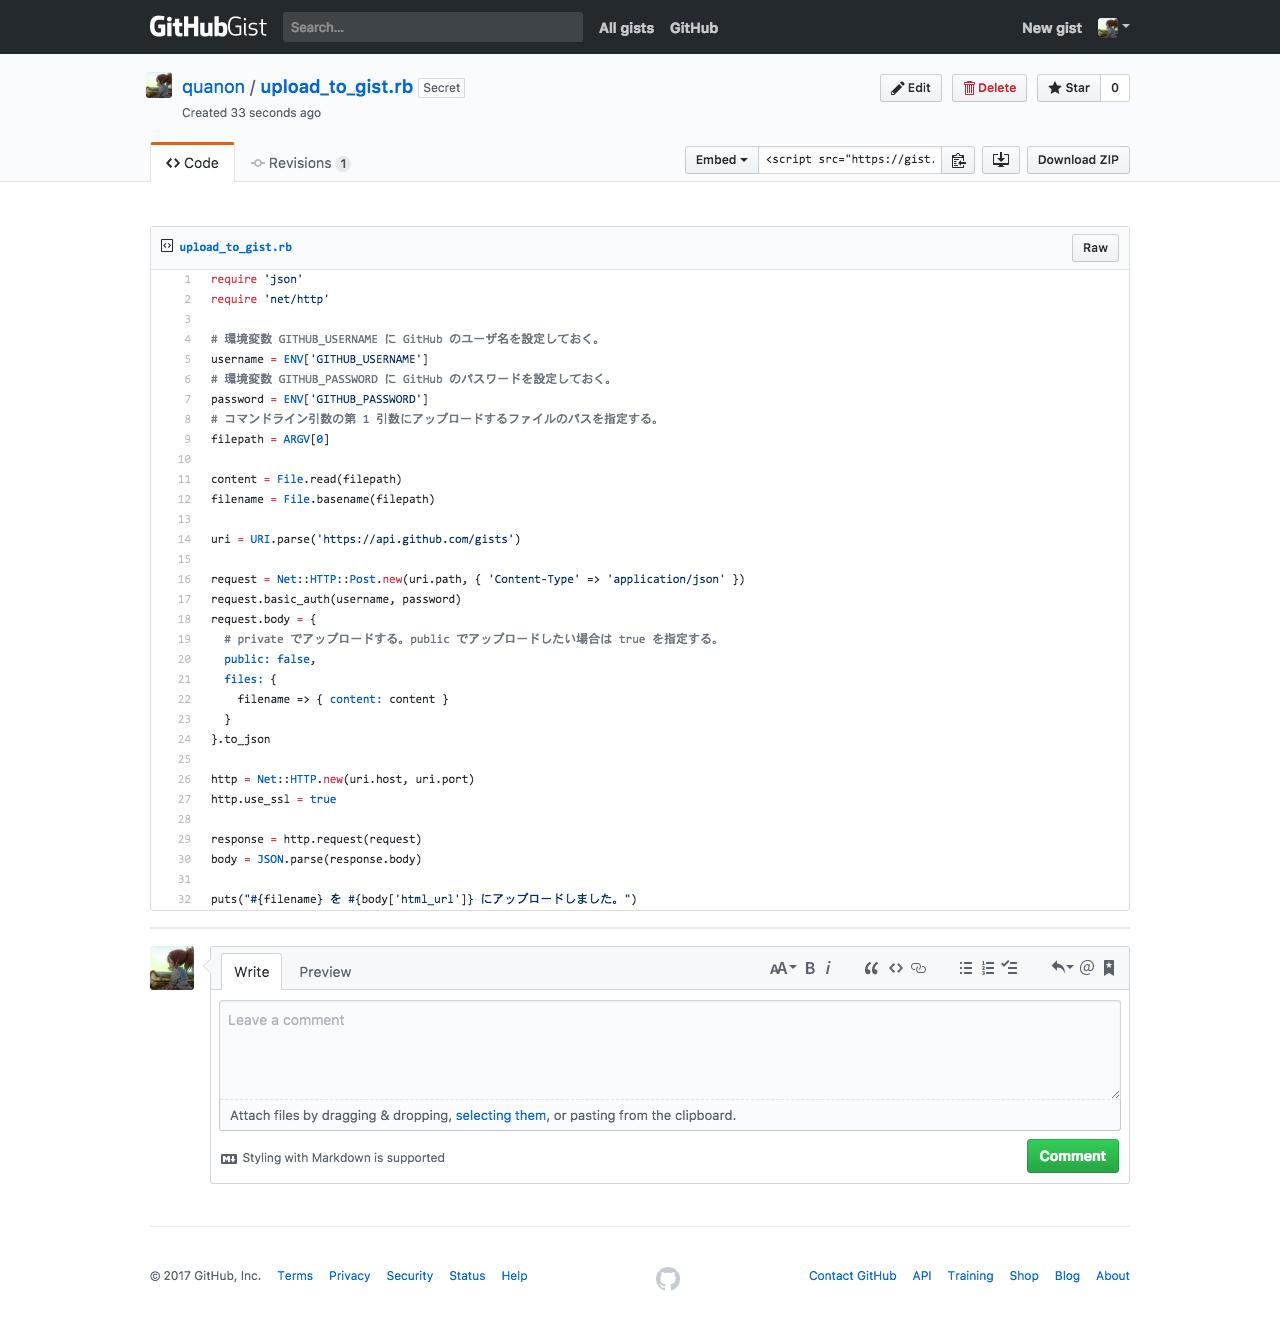 gist.github.com-quanon-f98fdcbf58539da7f2df69be0cb3bb35(Laptop with MDPI screen).png